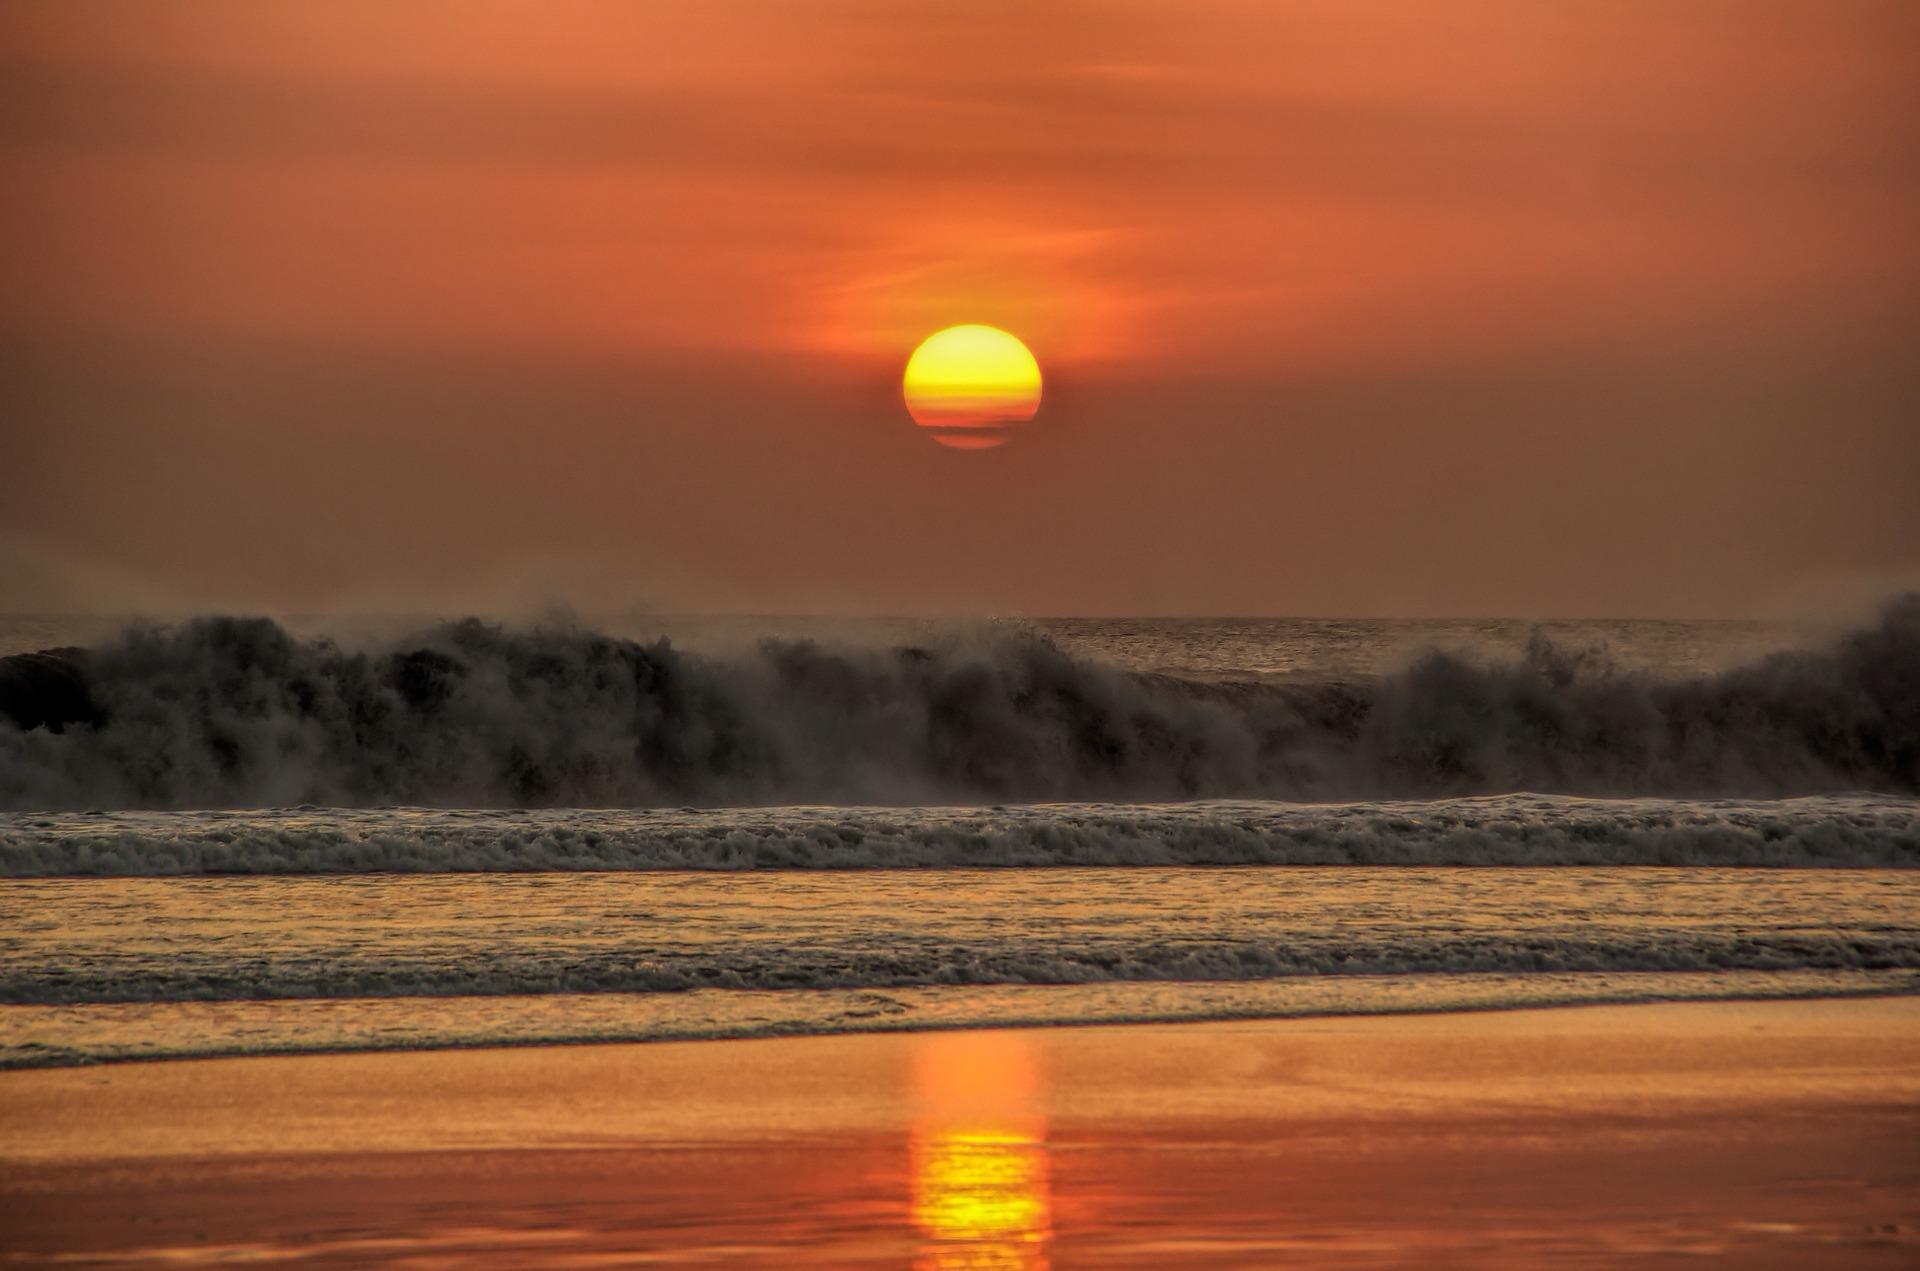 sunset-1337686_1920